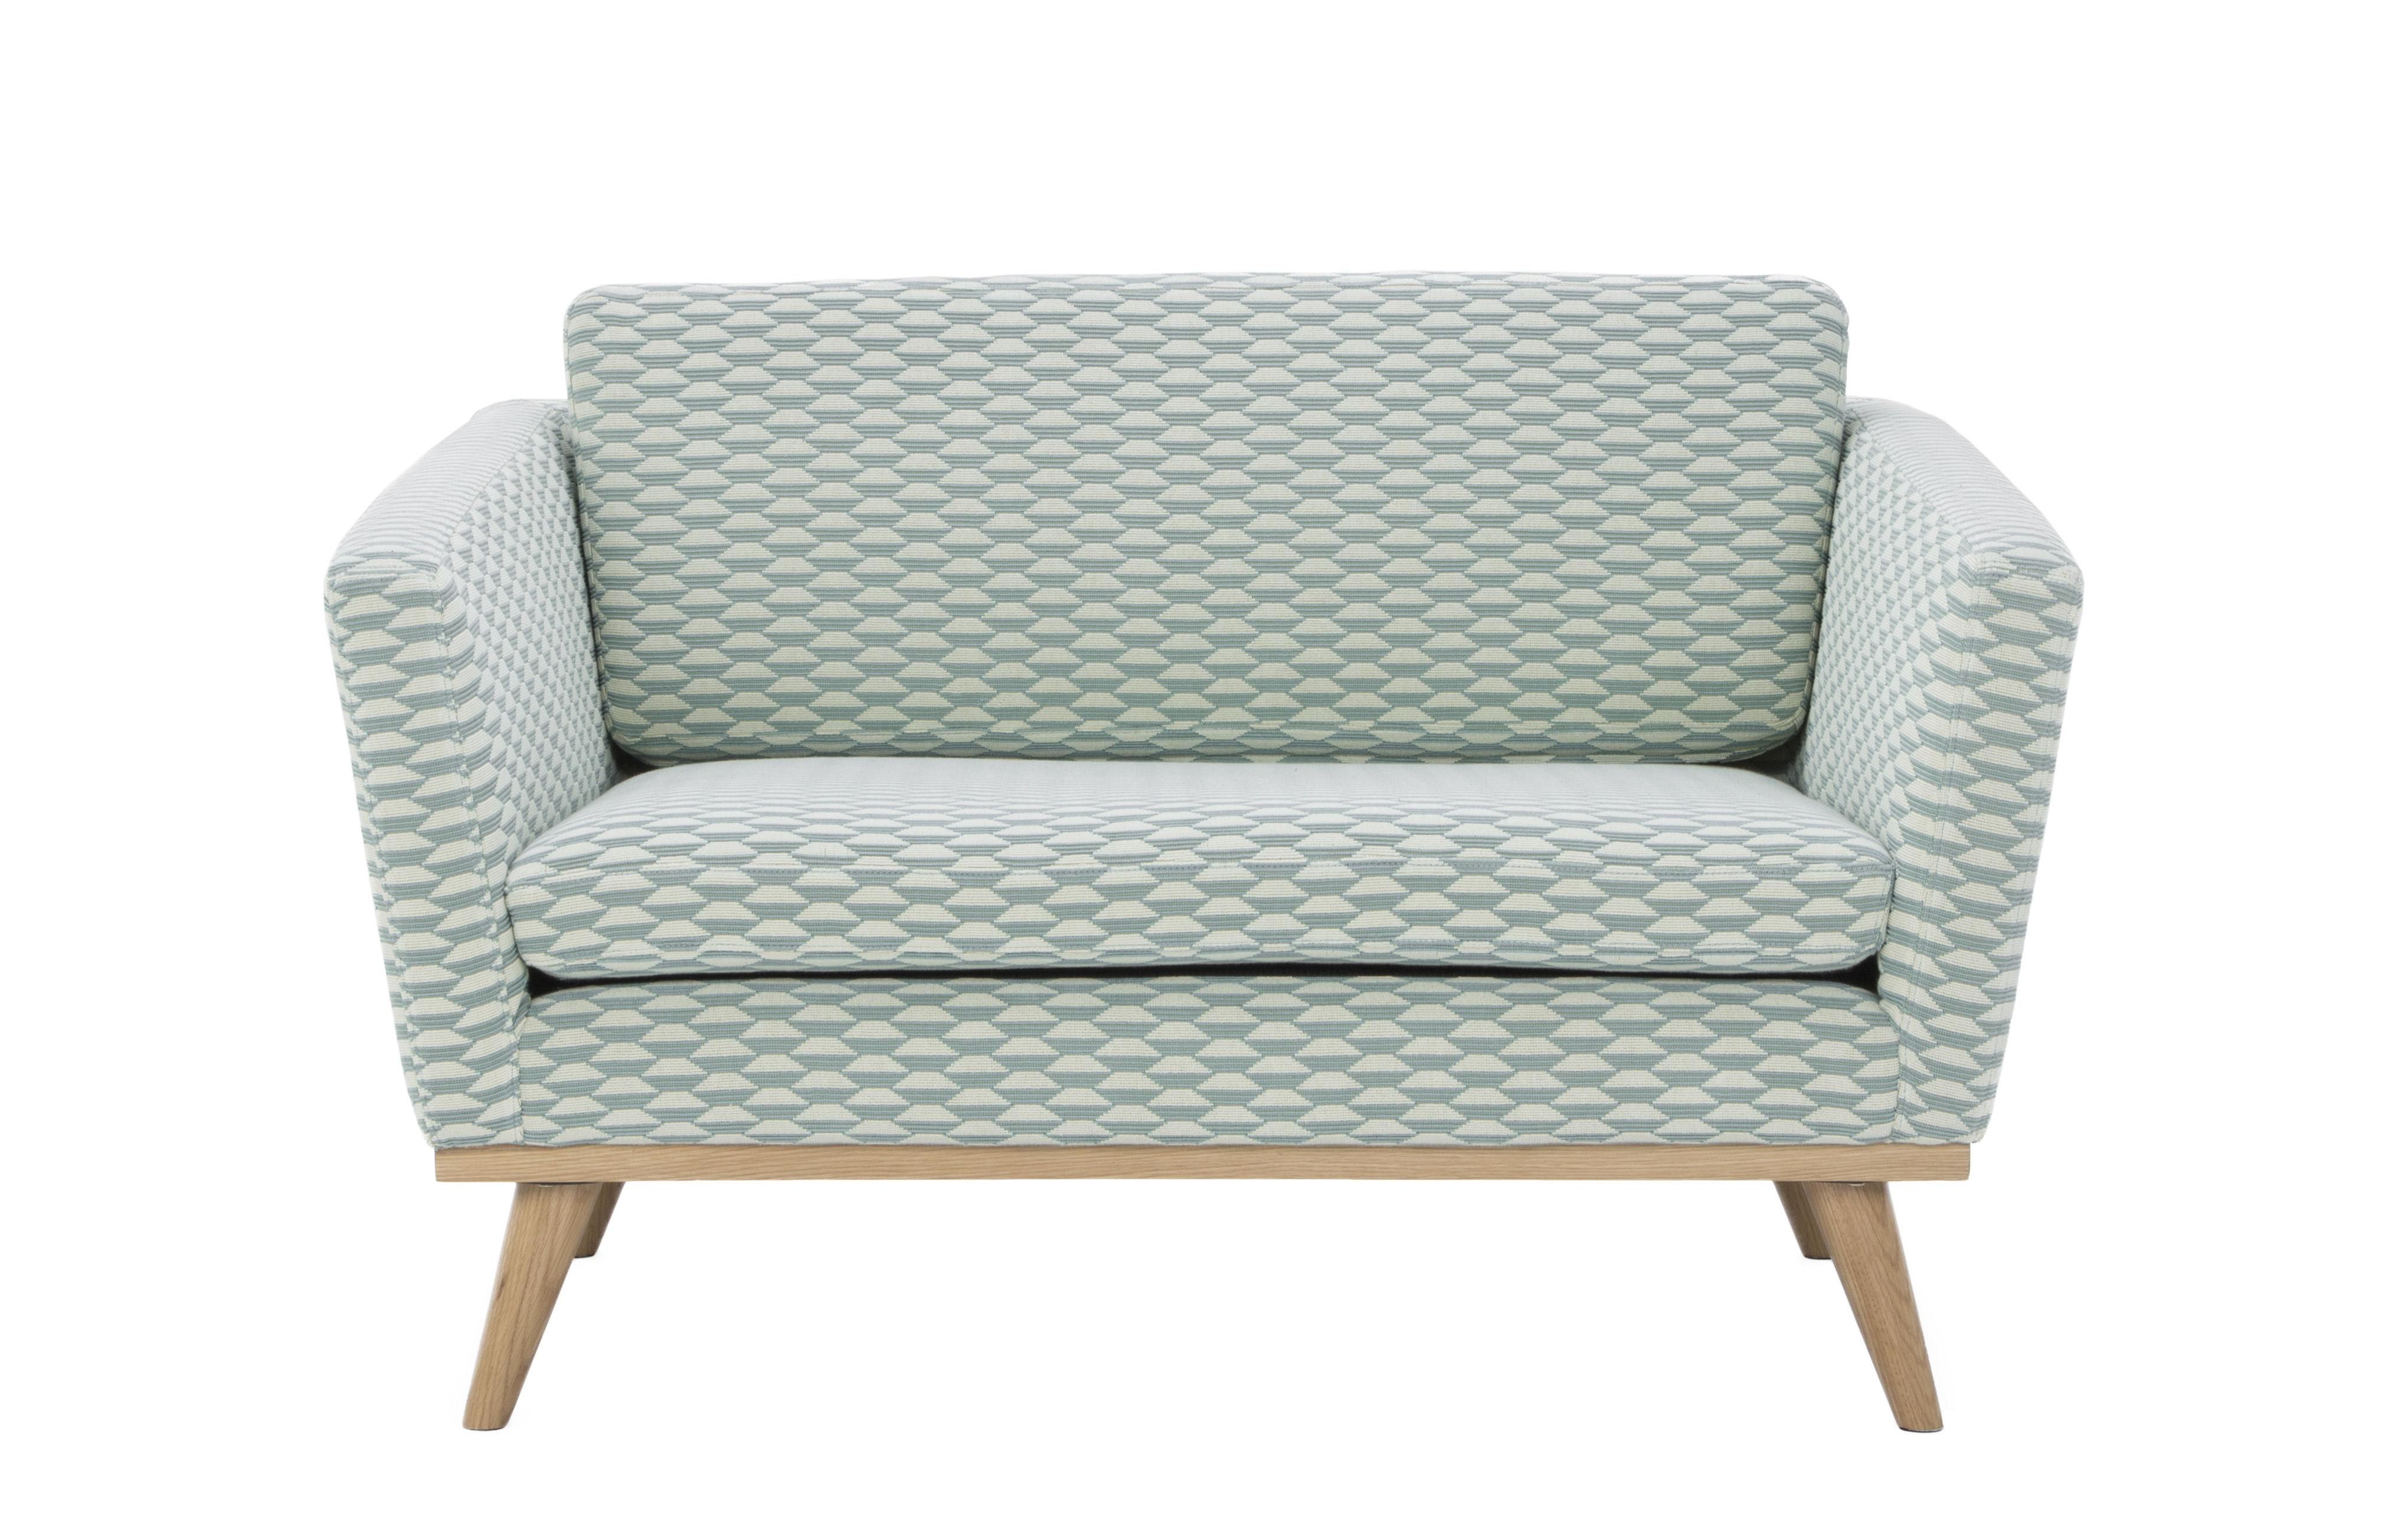 Möbel - Sofas - Sofa / L 120 cm - Stoff - RED Edition - Baku Seladongrün / Seladongrün - Baumwolle, Kaltschaum, massive Eiche